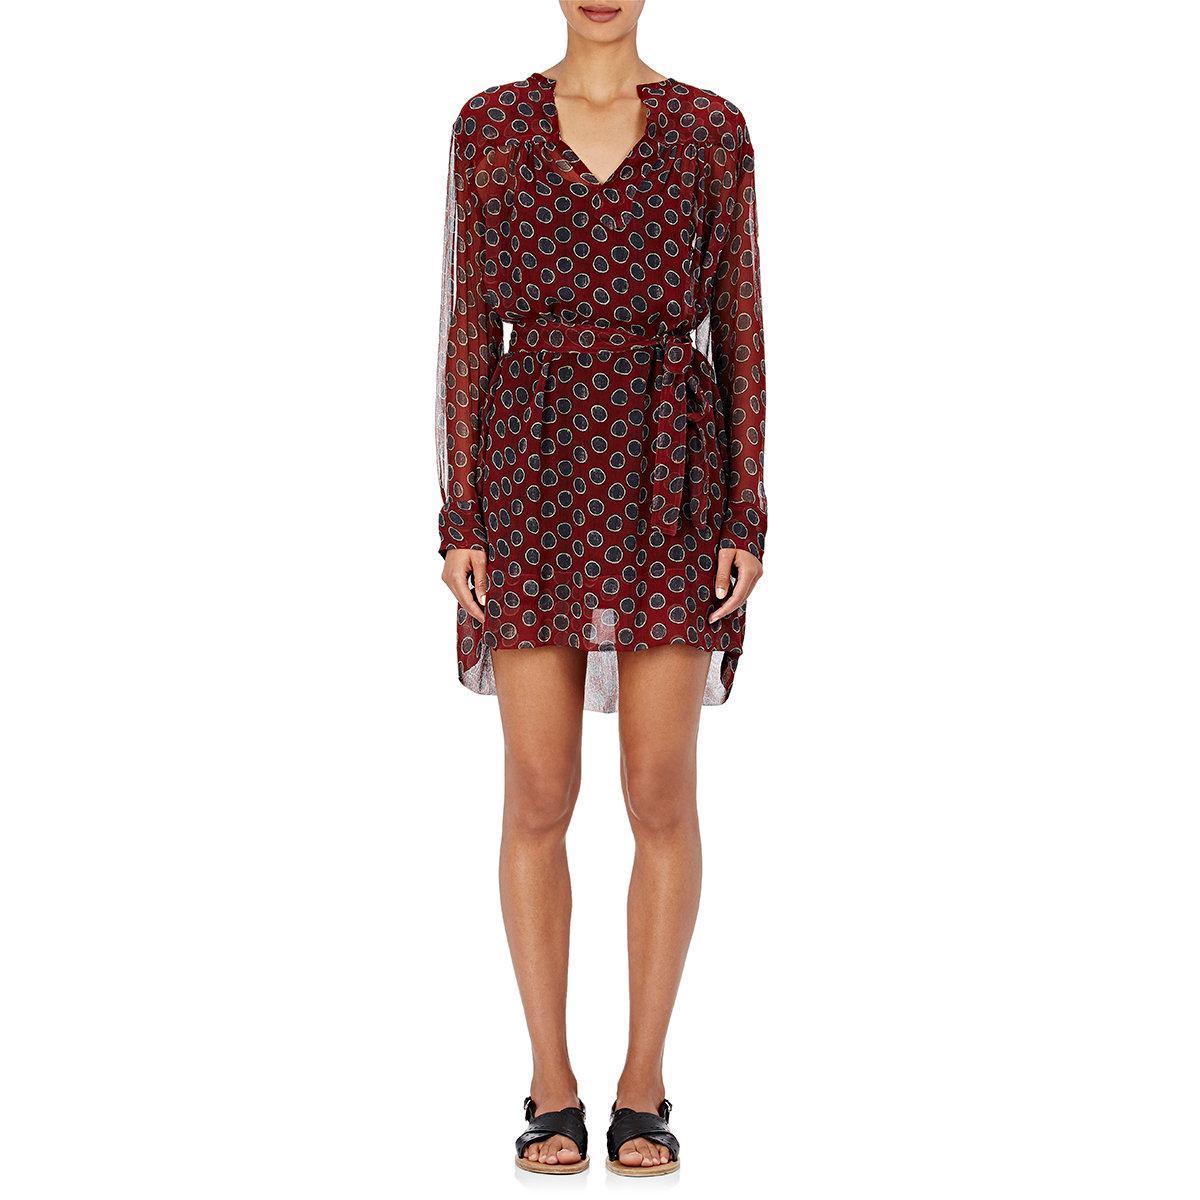 Toile isabel marant 39 bertha 39 shirt dress in red lyst for Isabel marant shirt dress